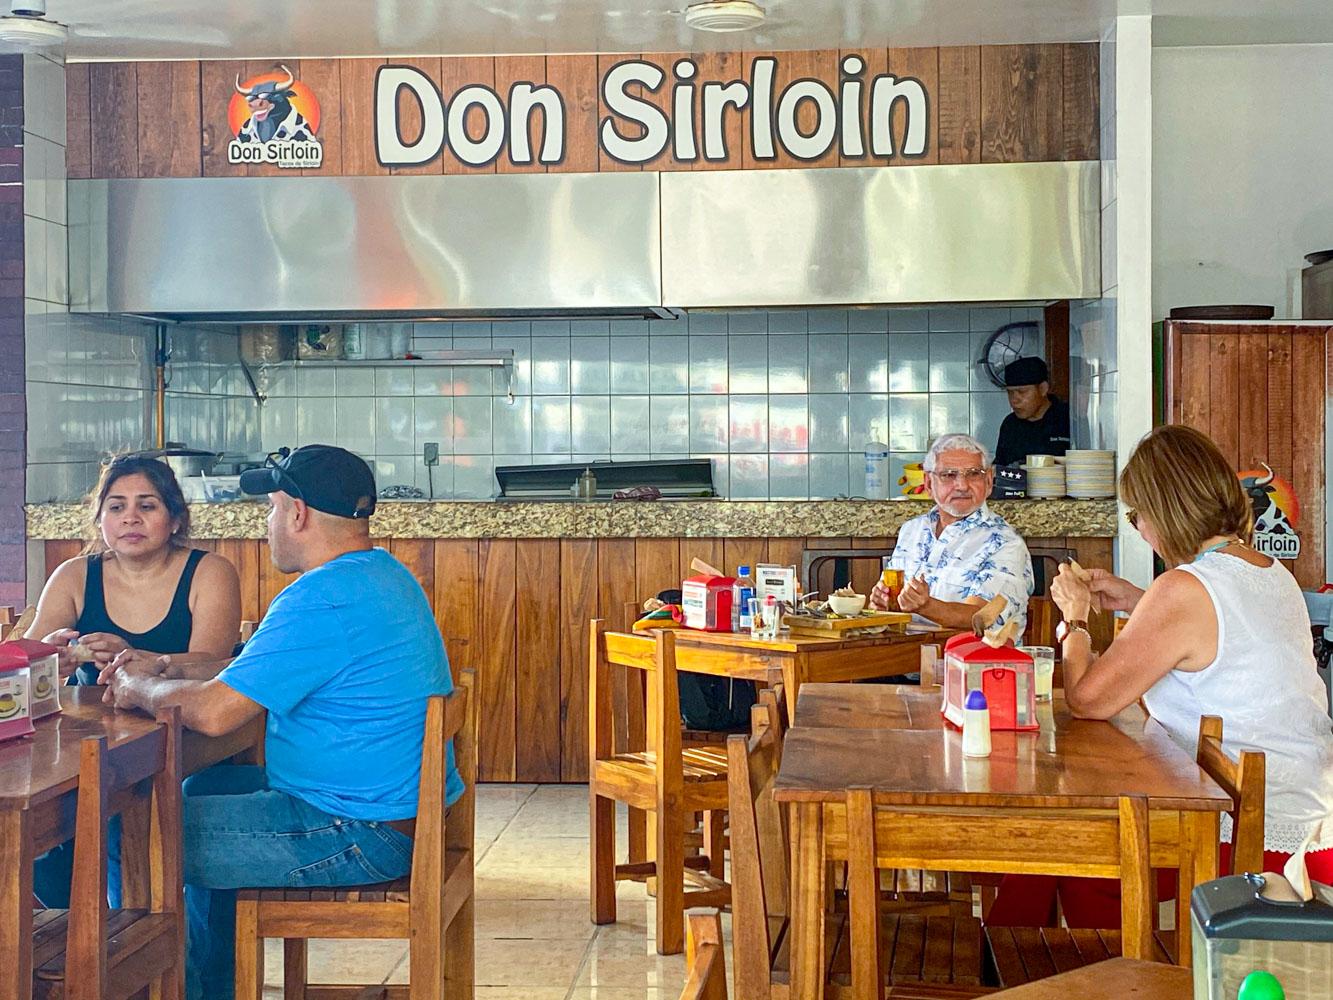 The outdoor restaurant, Don Sirloin